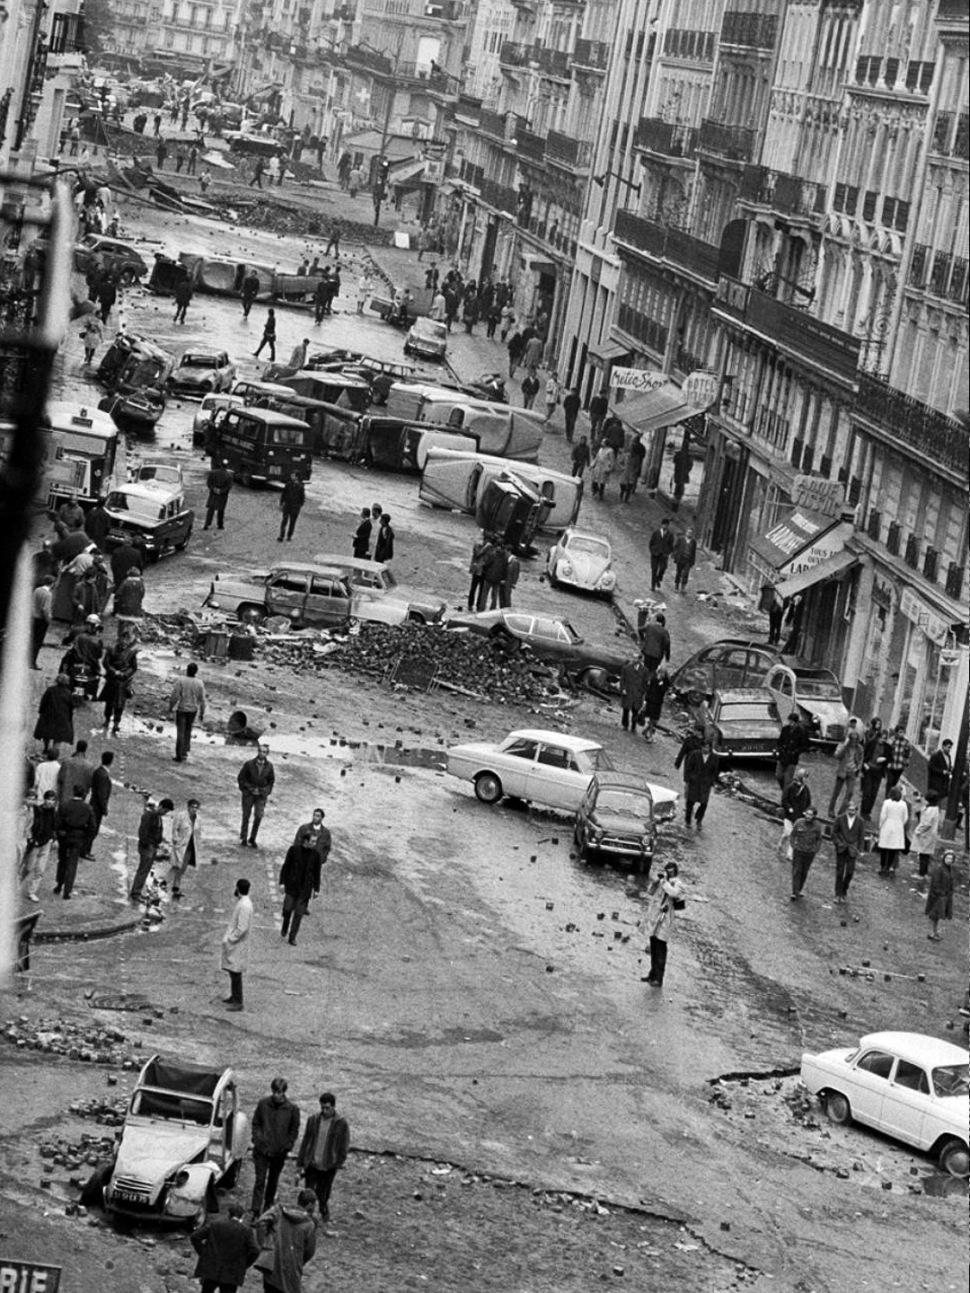 200525-may-1968-paris